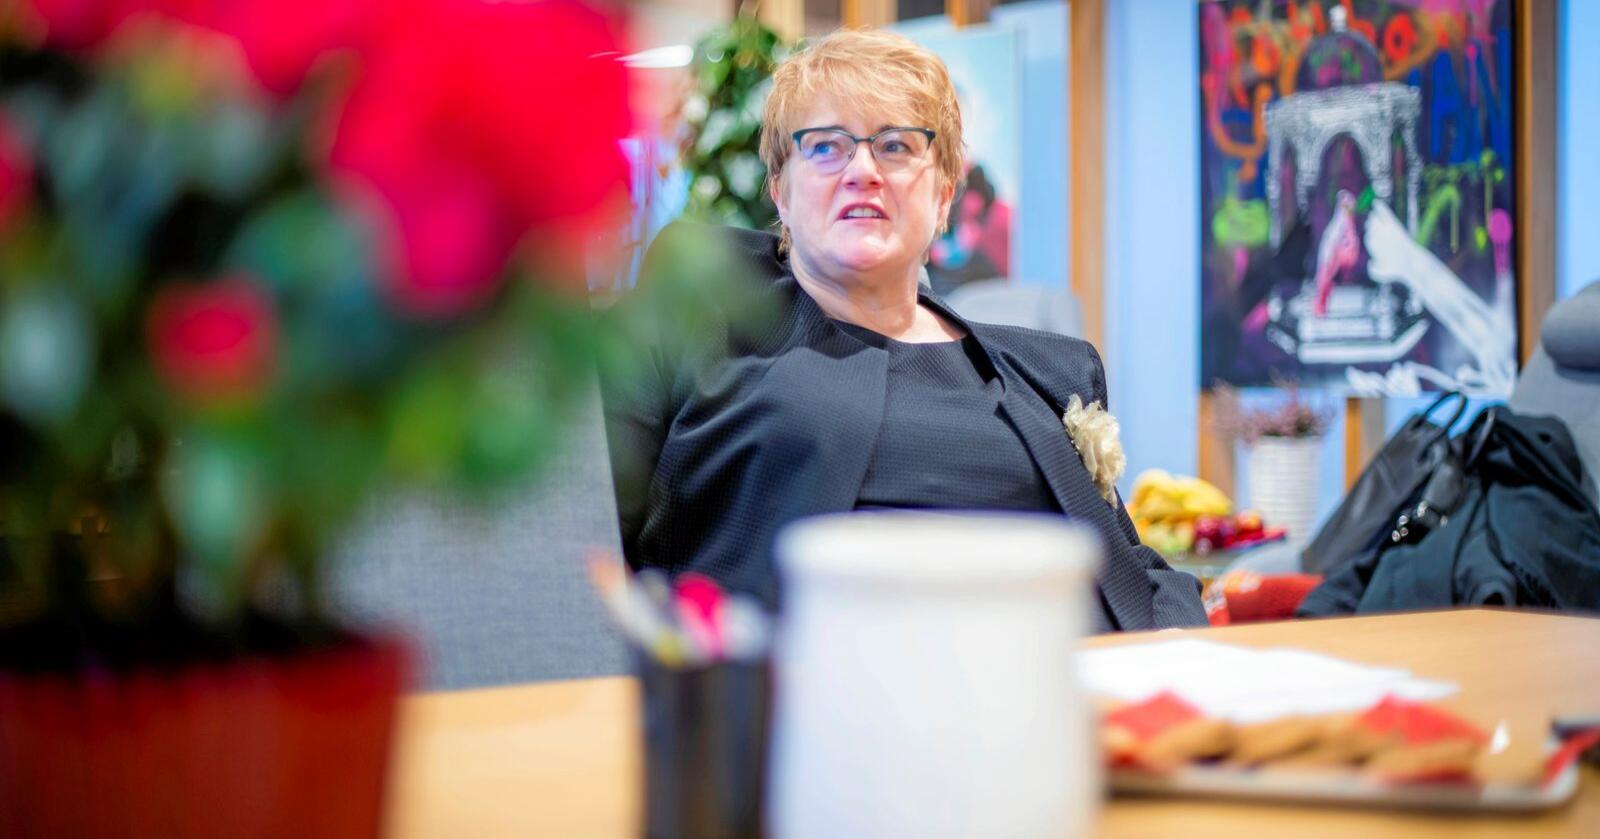 Venstre-leder Trine Skei Grande. Partiet havner langt under sperregrensa på en ny måling. Foto: Håkon Mosvold Larsen / NTB scanpix